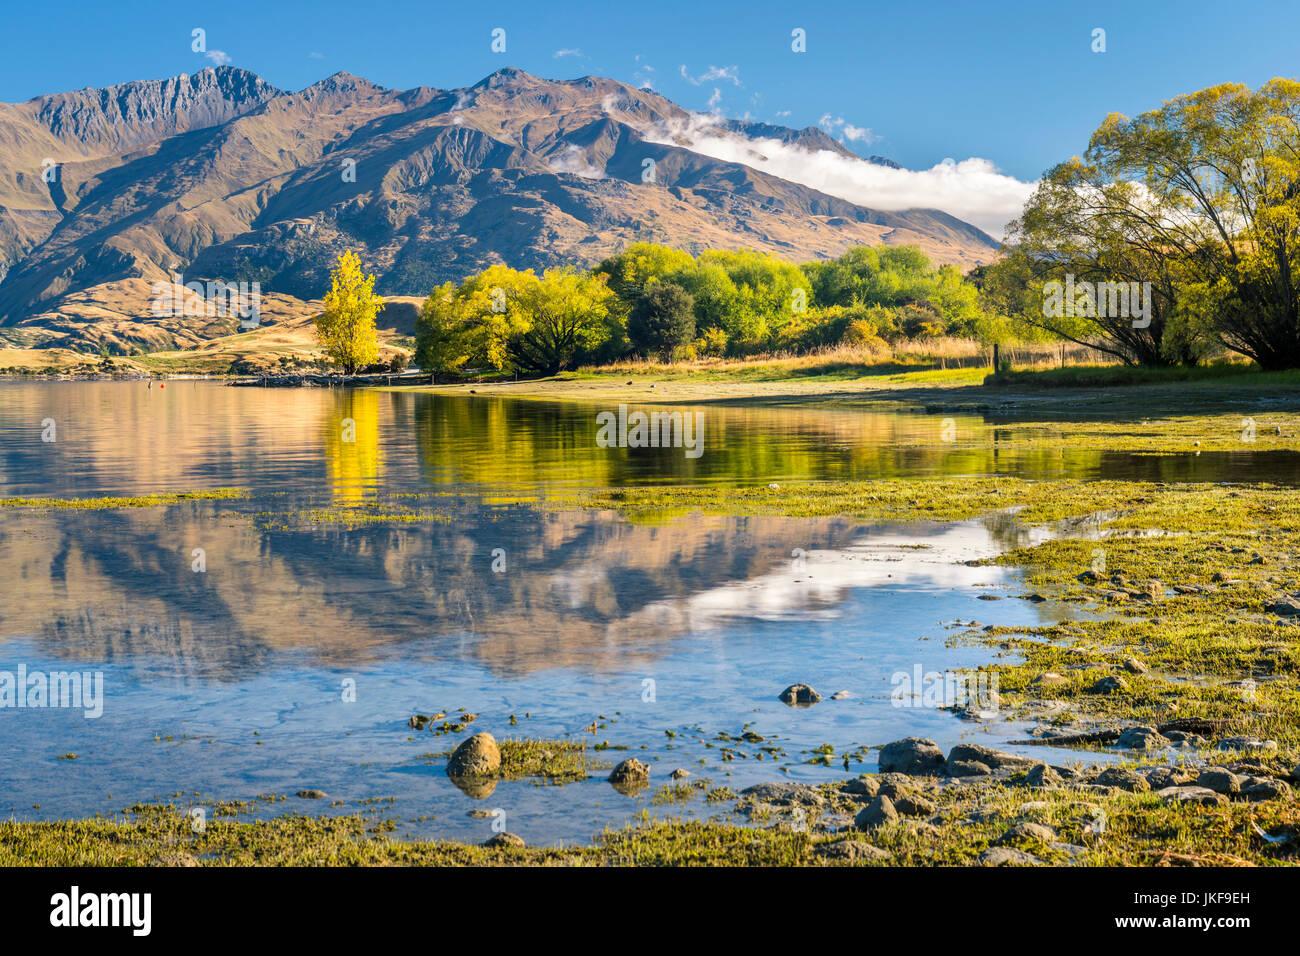 Nouvelle Zélande, île du sud, gledhu Bay au lac Wanaka Photo Stock